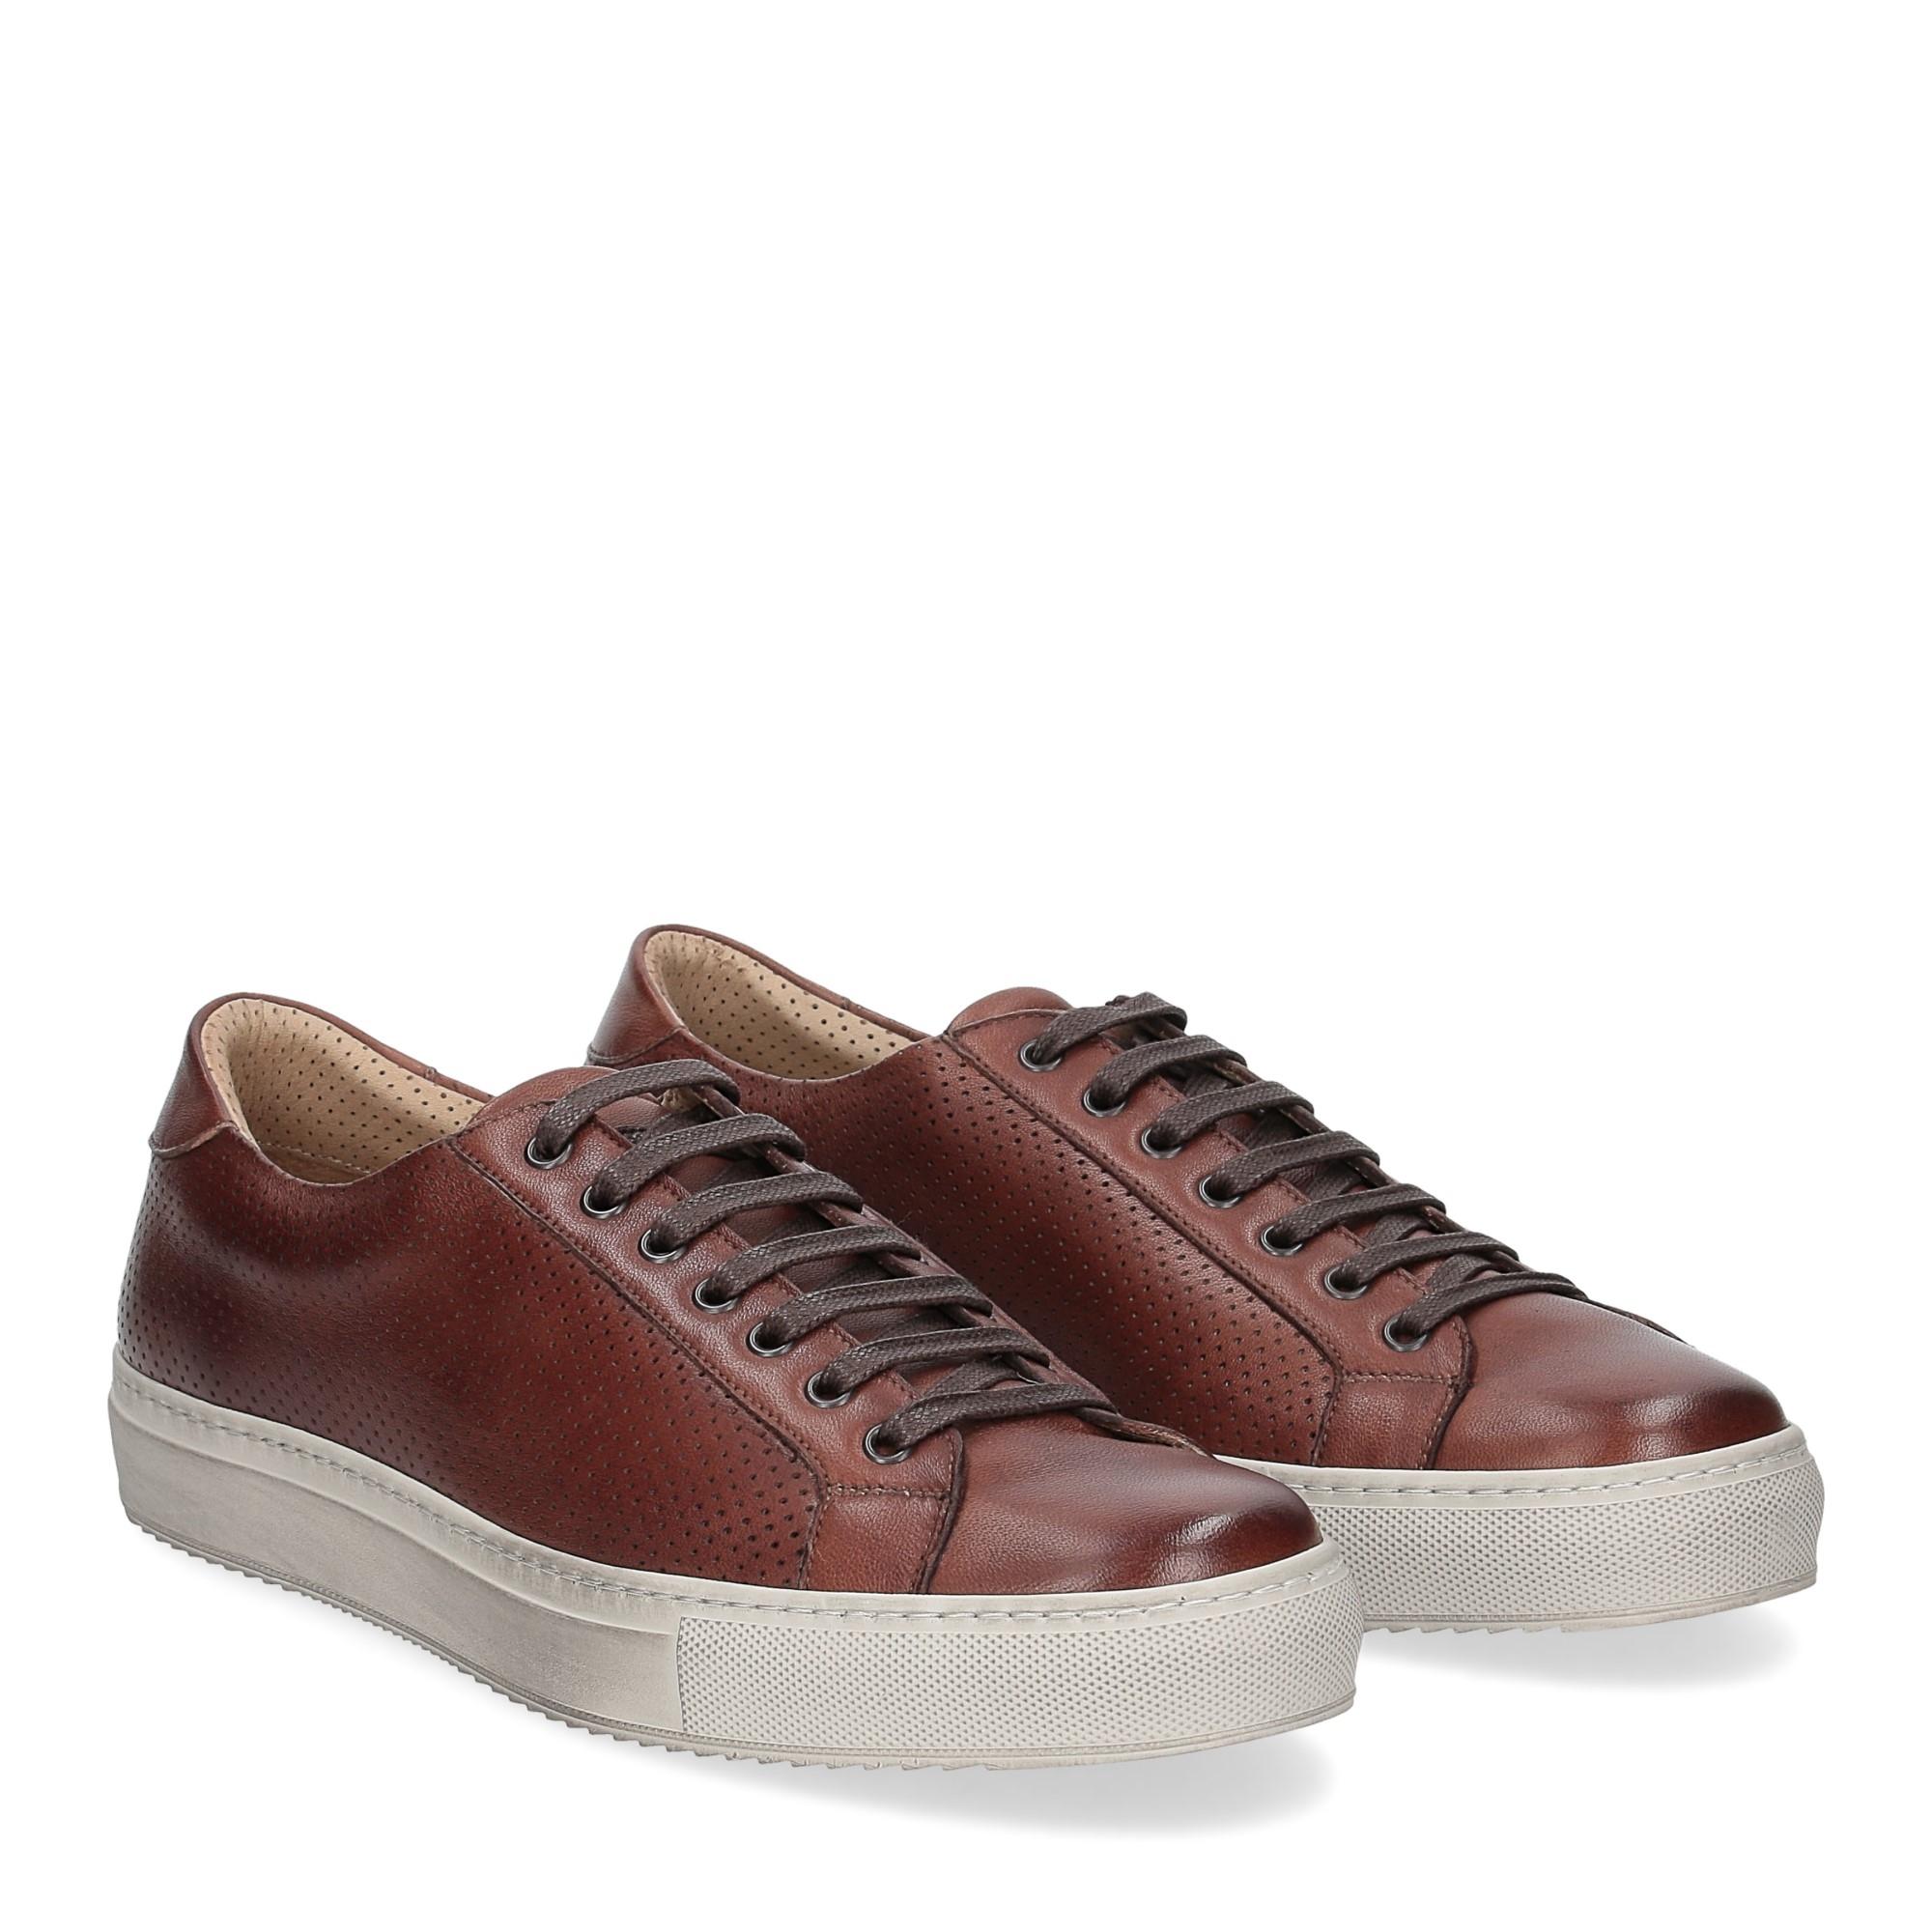 Griffi's sneaker 1102 pelle forata marrone